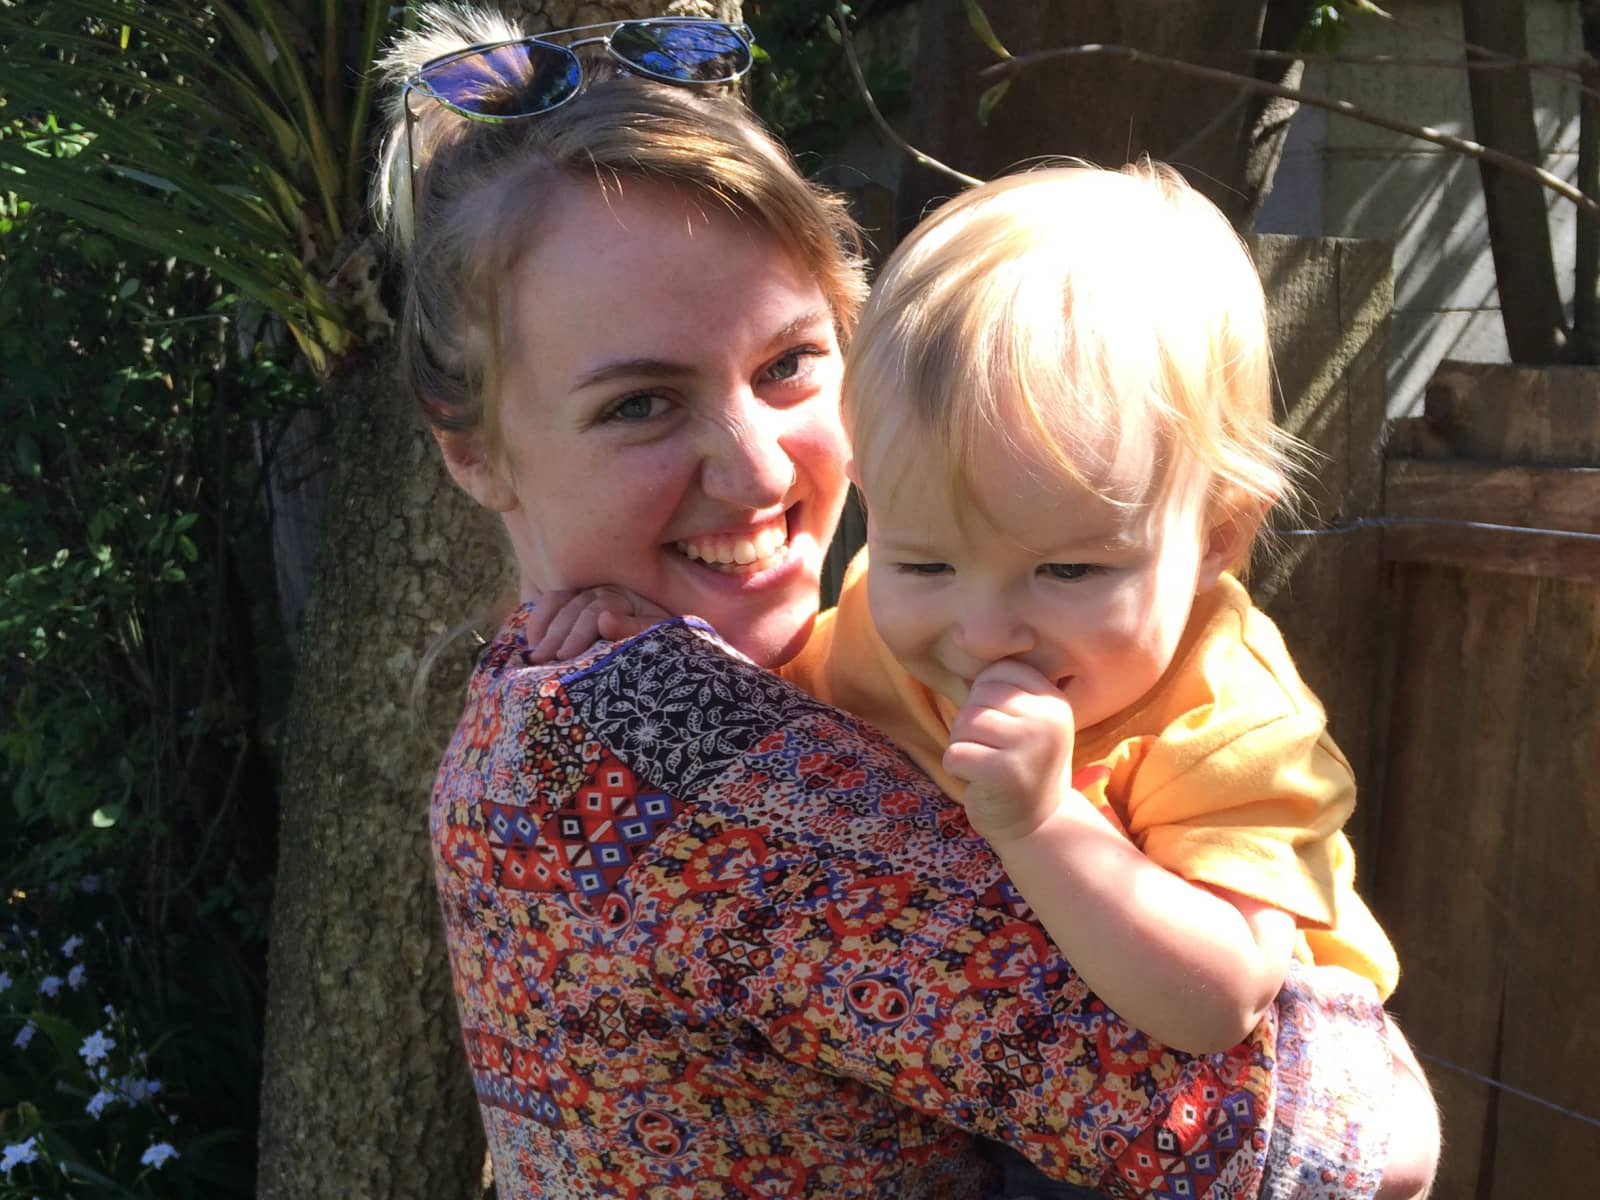 Sadia from Christchurch, New Zealand